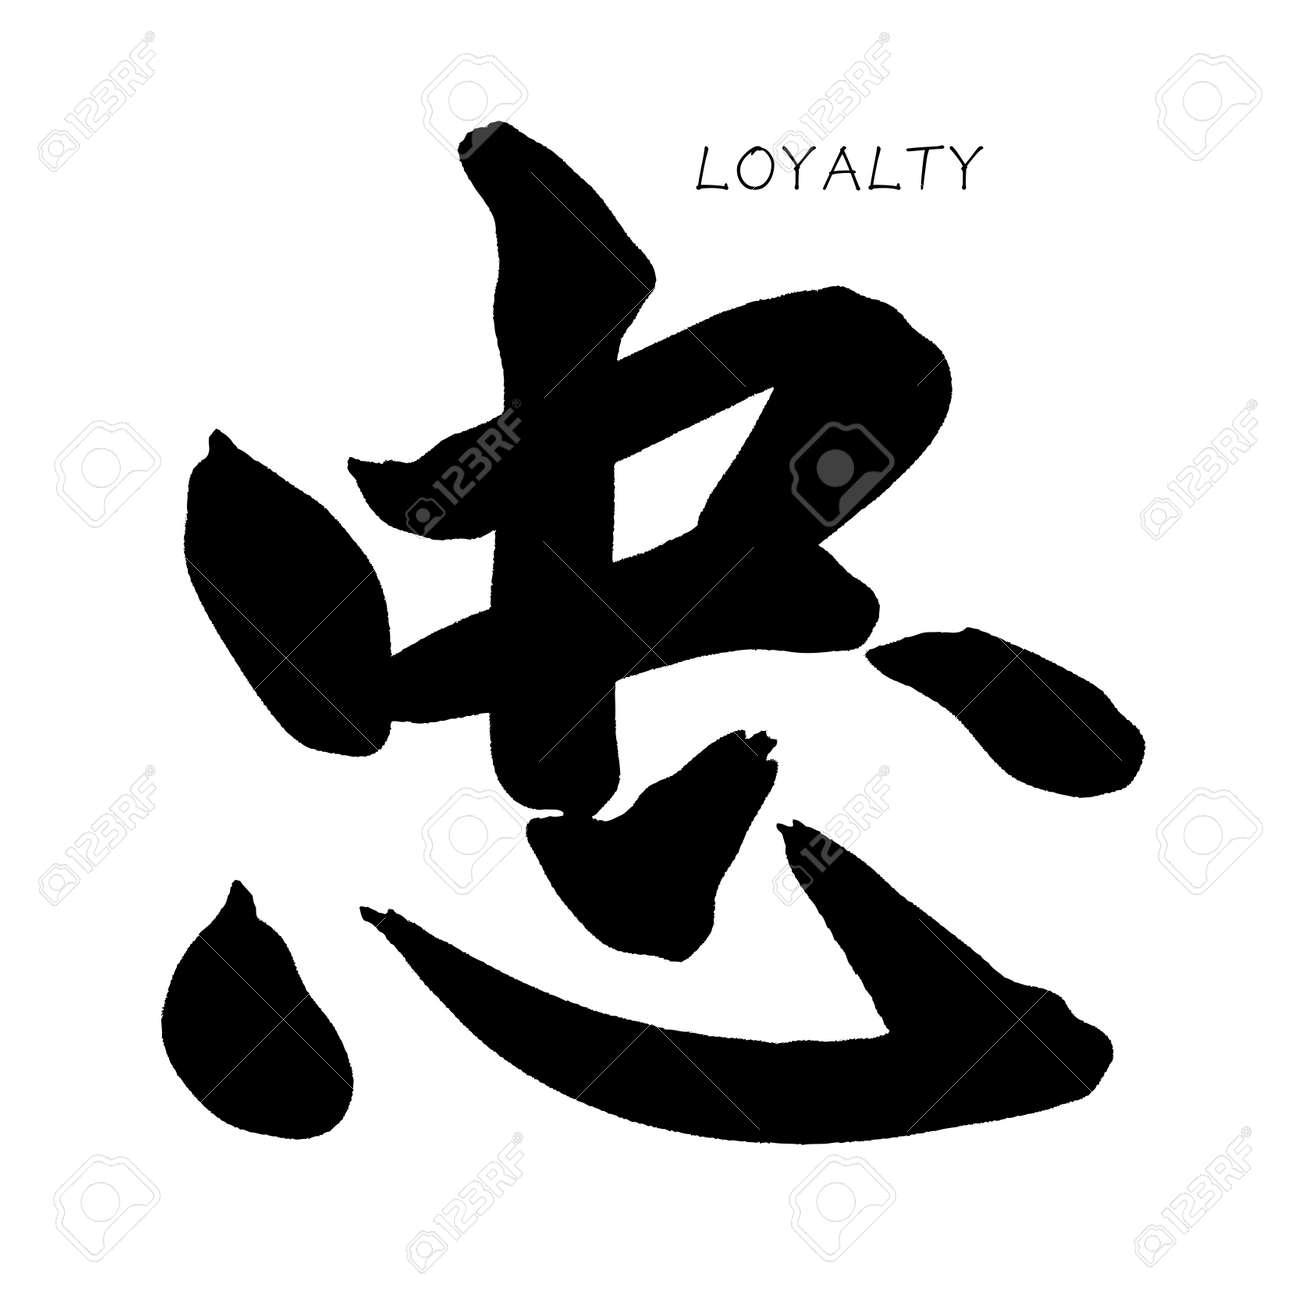 Chinese Calligraphy Zhong Loyal Loyalty Devoted